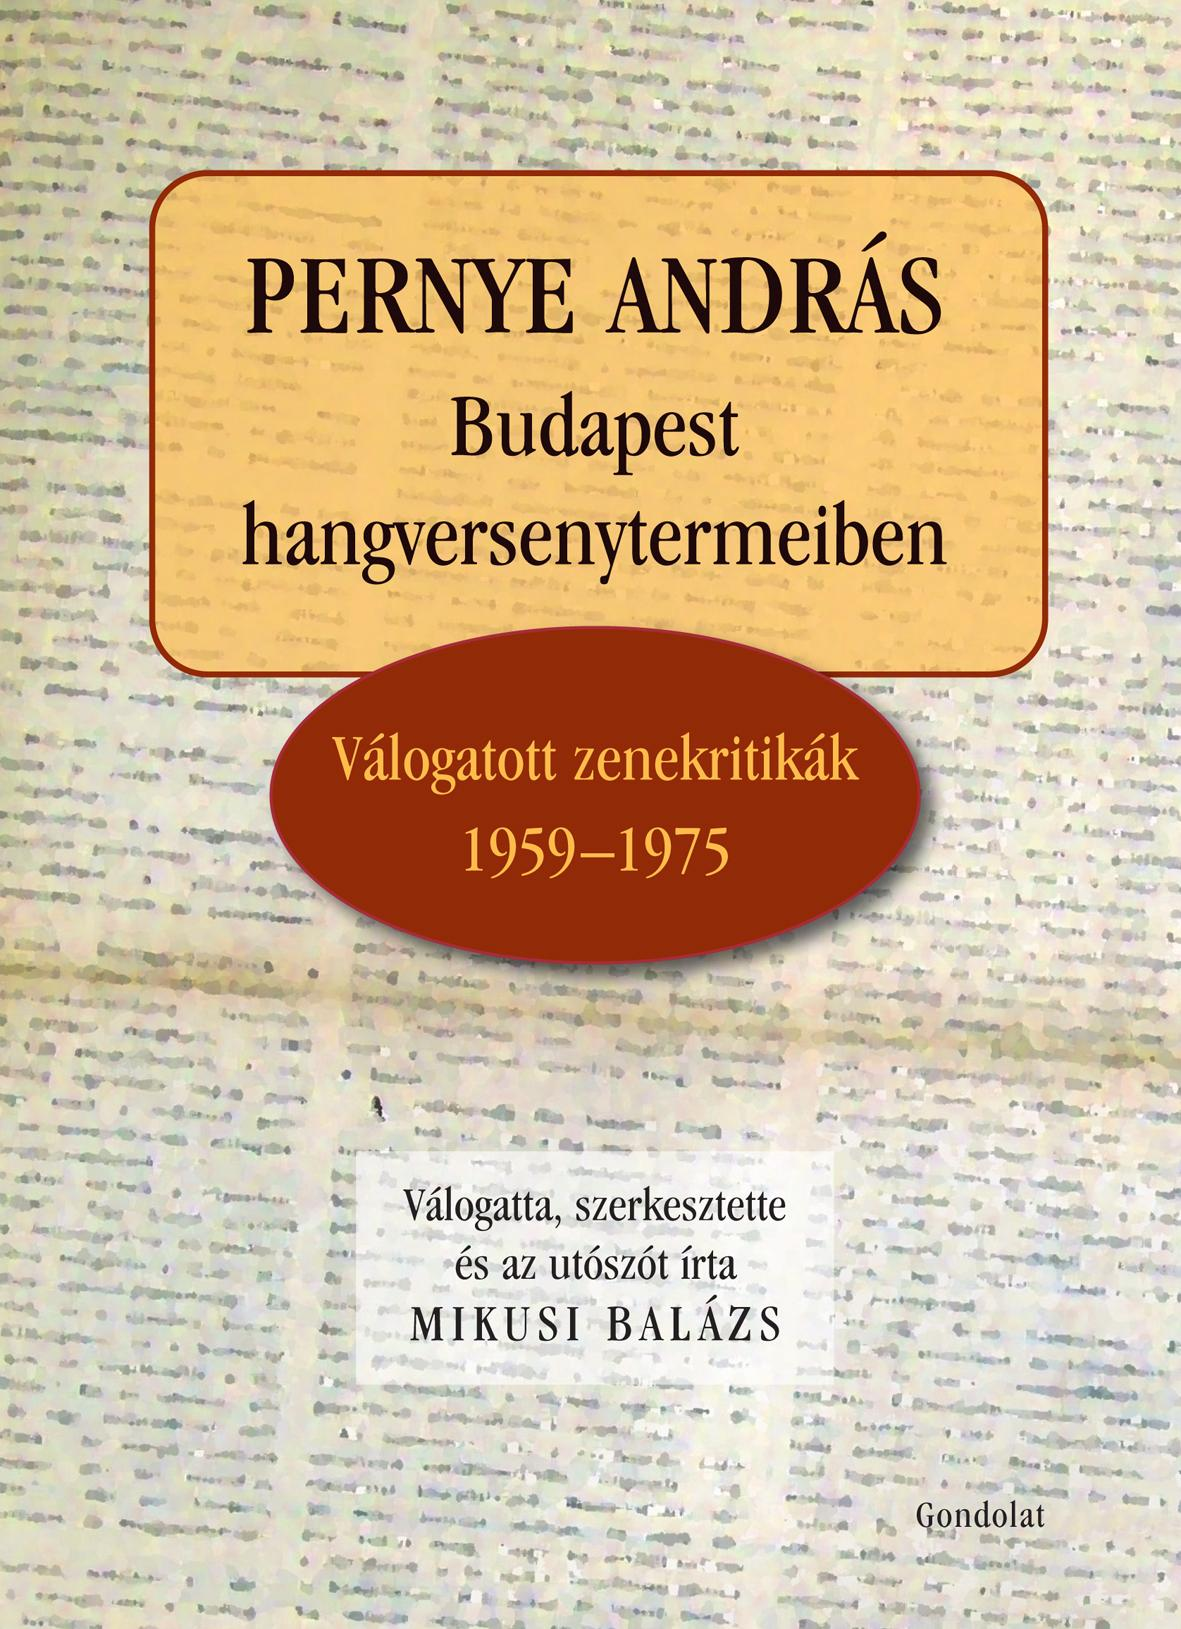 - PERNYE ANDRÁS BUDAPEST HANGVERSENYTERMEIBEN